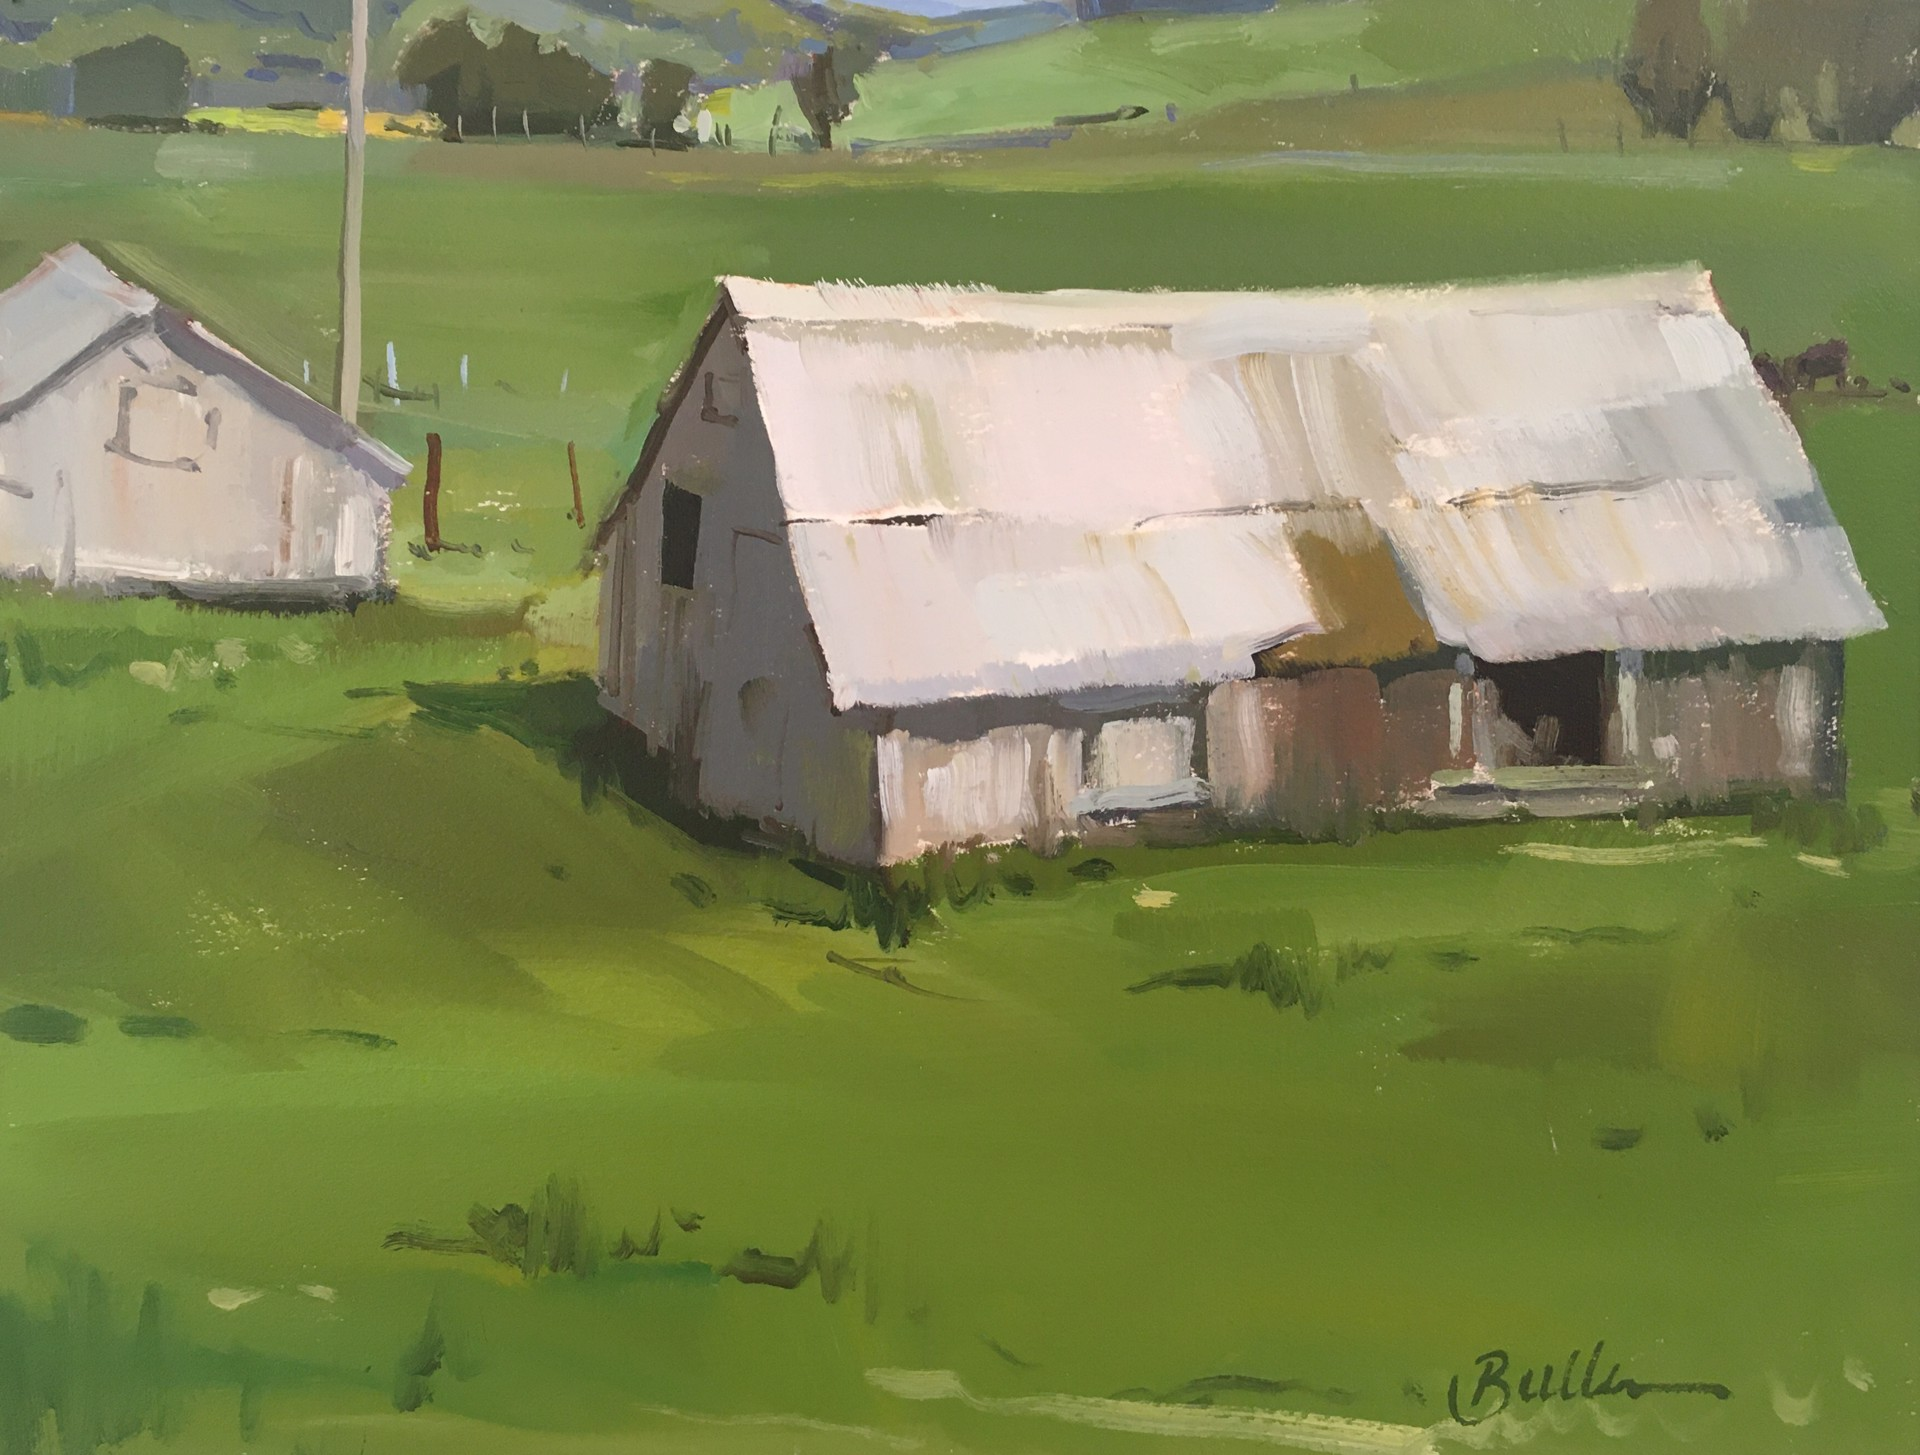 Old Chicken Barn by Samantha Buller